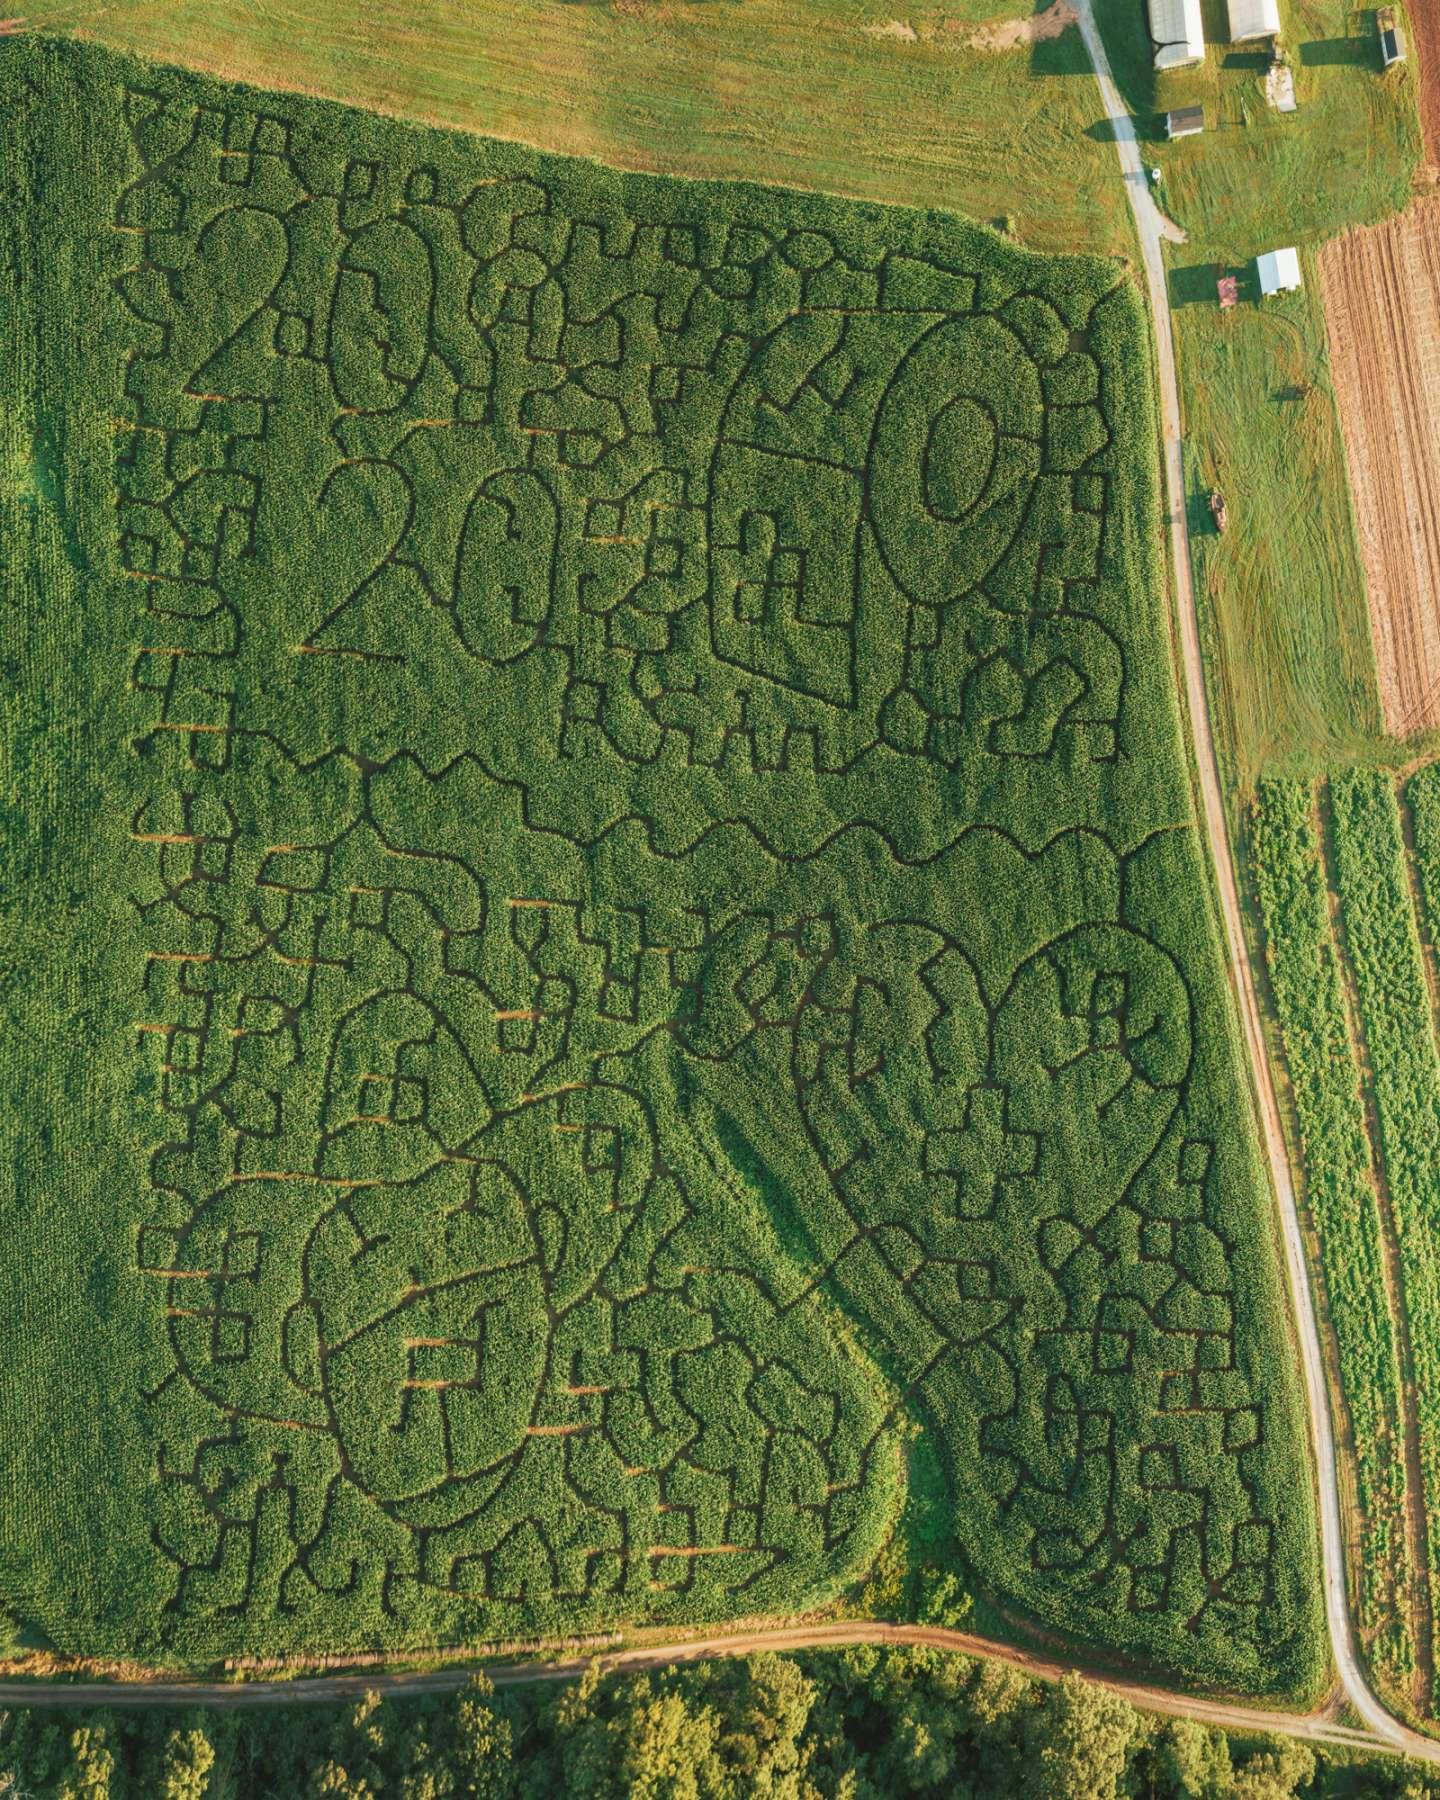 Yoder's Farm Corn Maze 2020